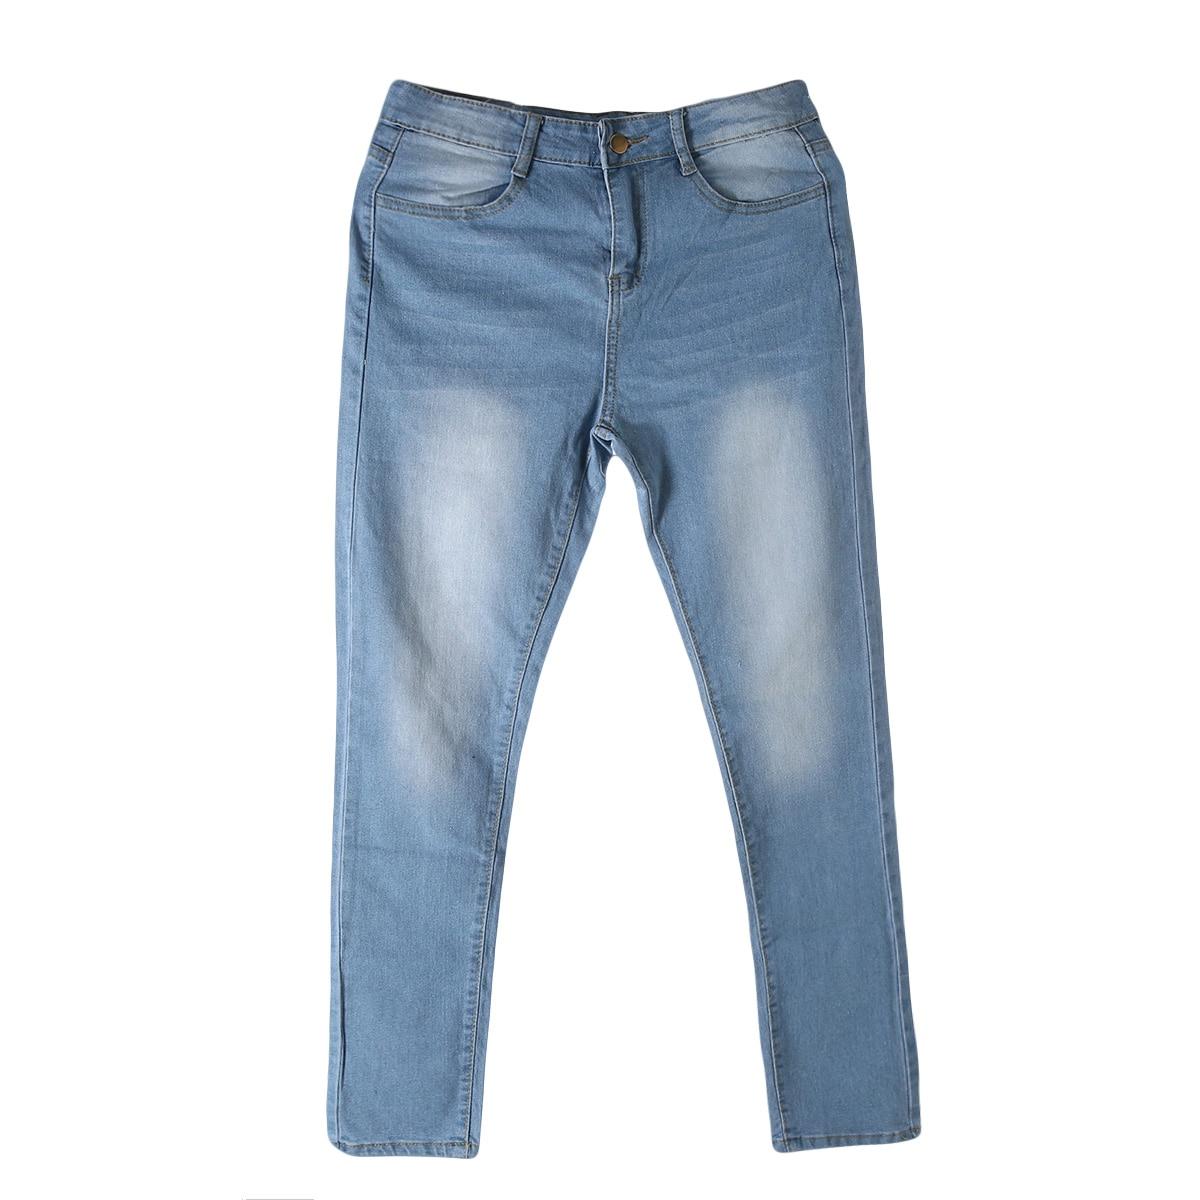 Women Lady Denim Skinny Pants High Waist Stretch Jeans Slim Pencil Jeans Women Casual Jeans 5